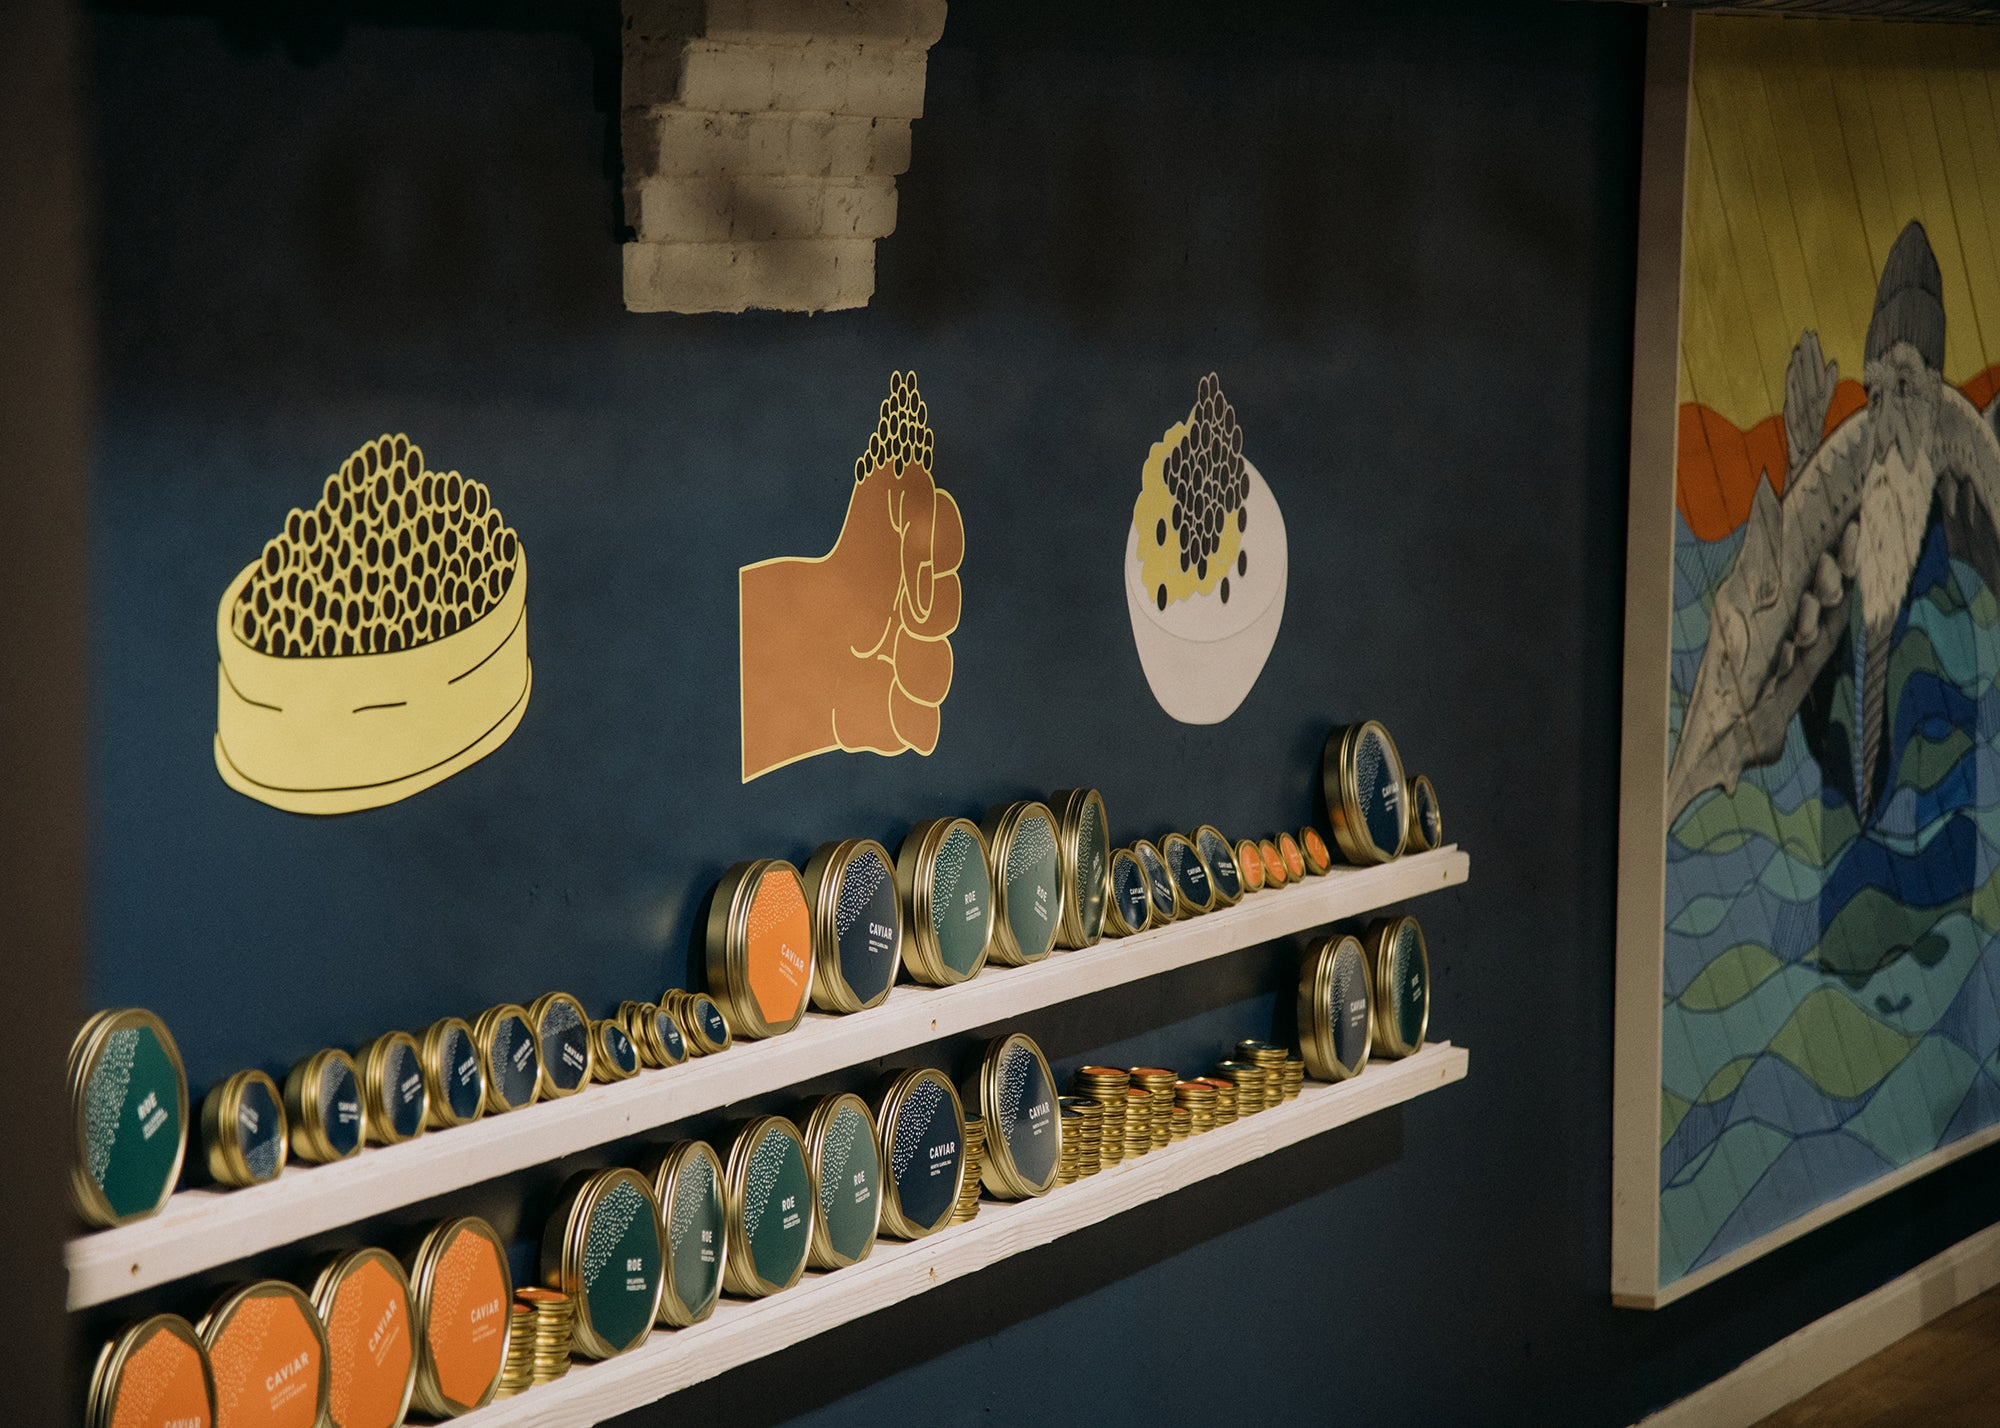 Island Creek Oyster caviar pop-up